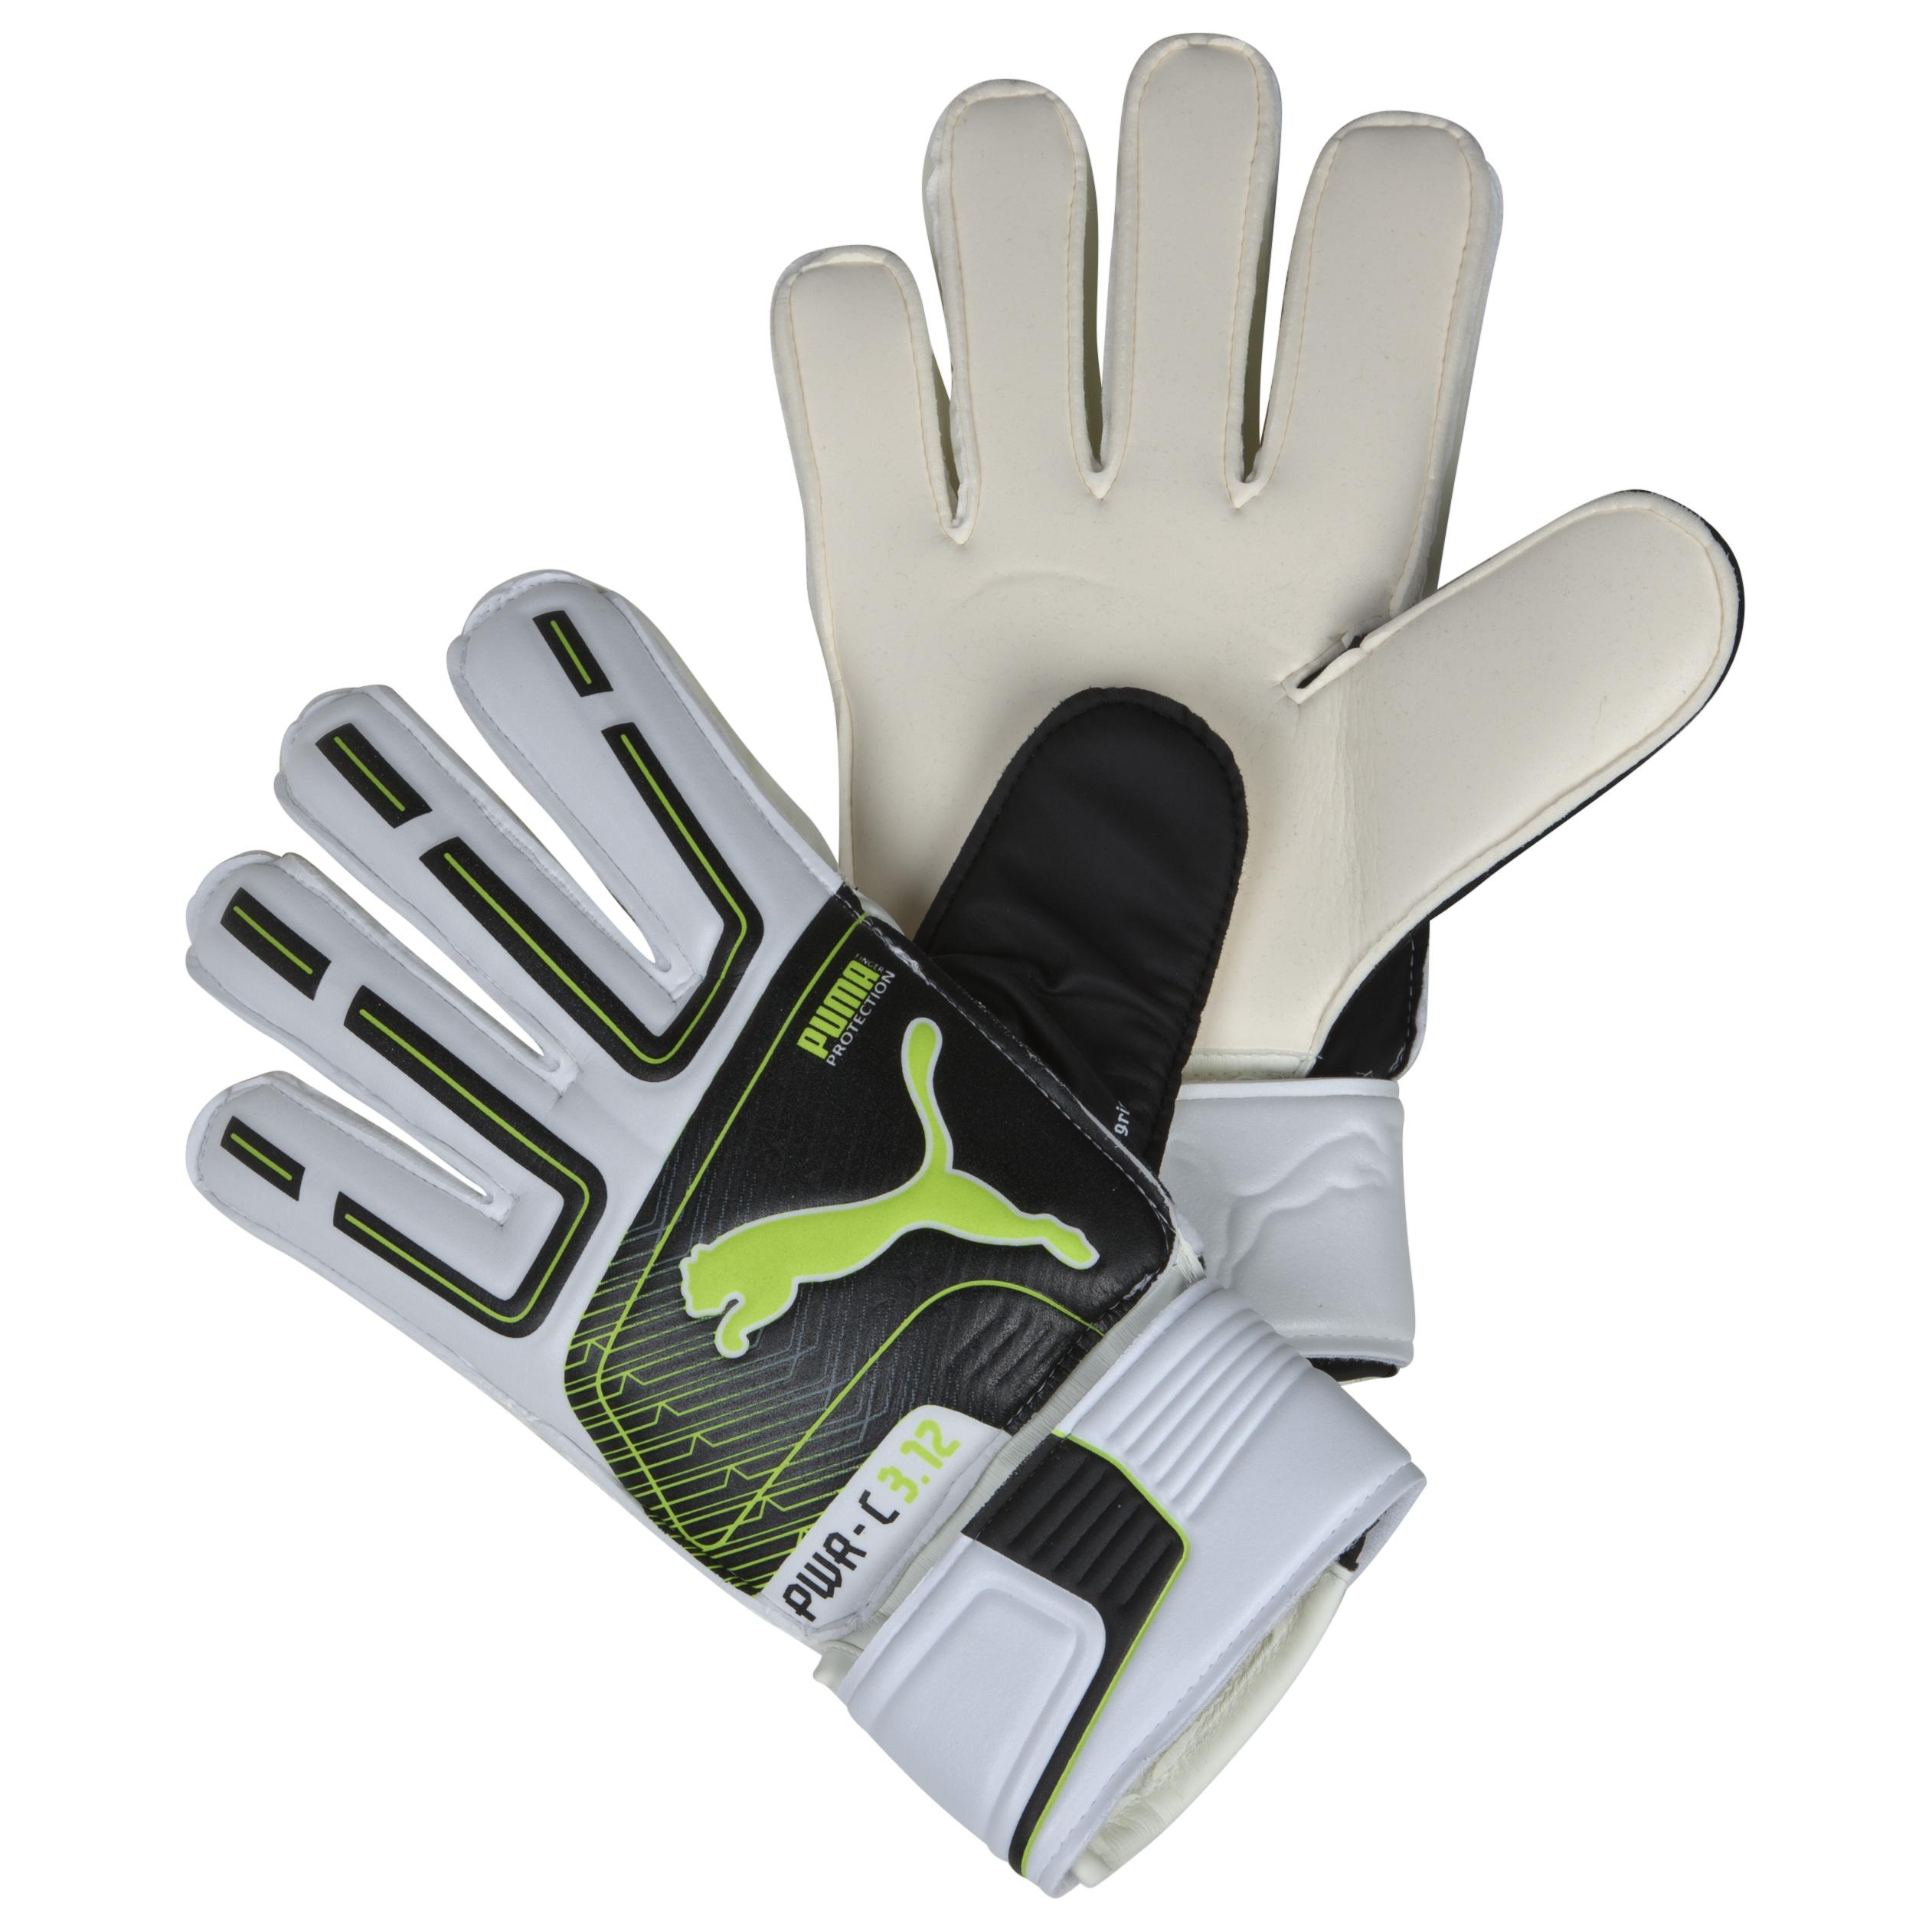 Puma PowerCat 3.12 Protect Goalkeeper Gloves - White/Black/Lime Punch/Dark Shadow